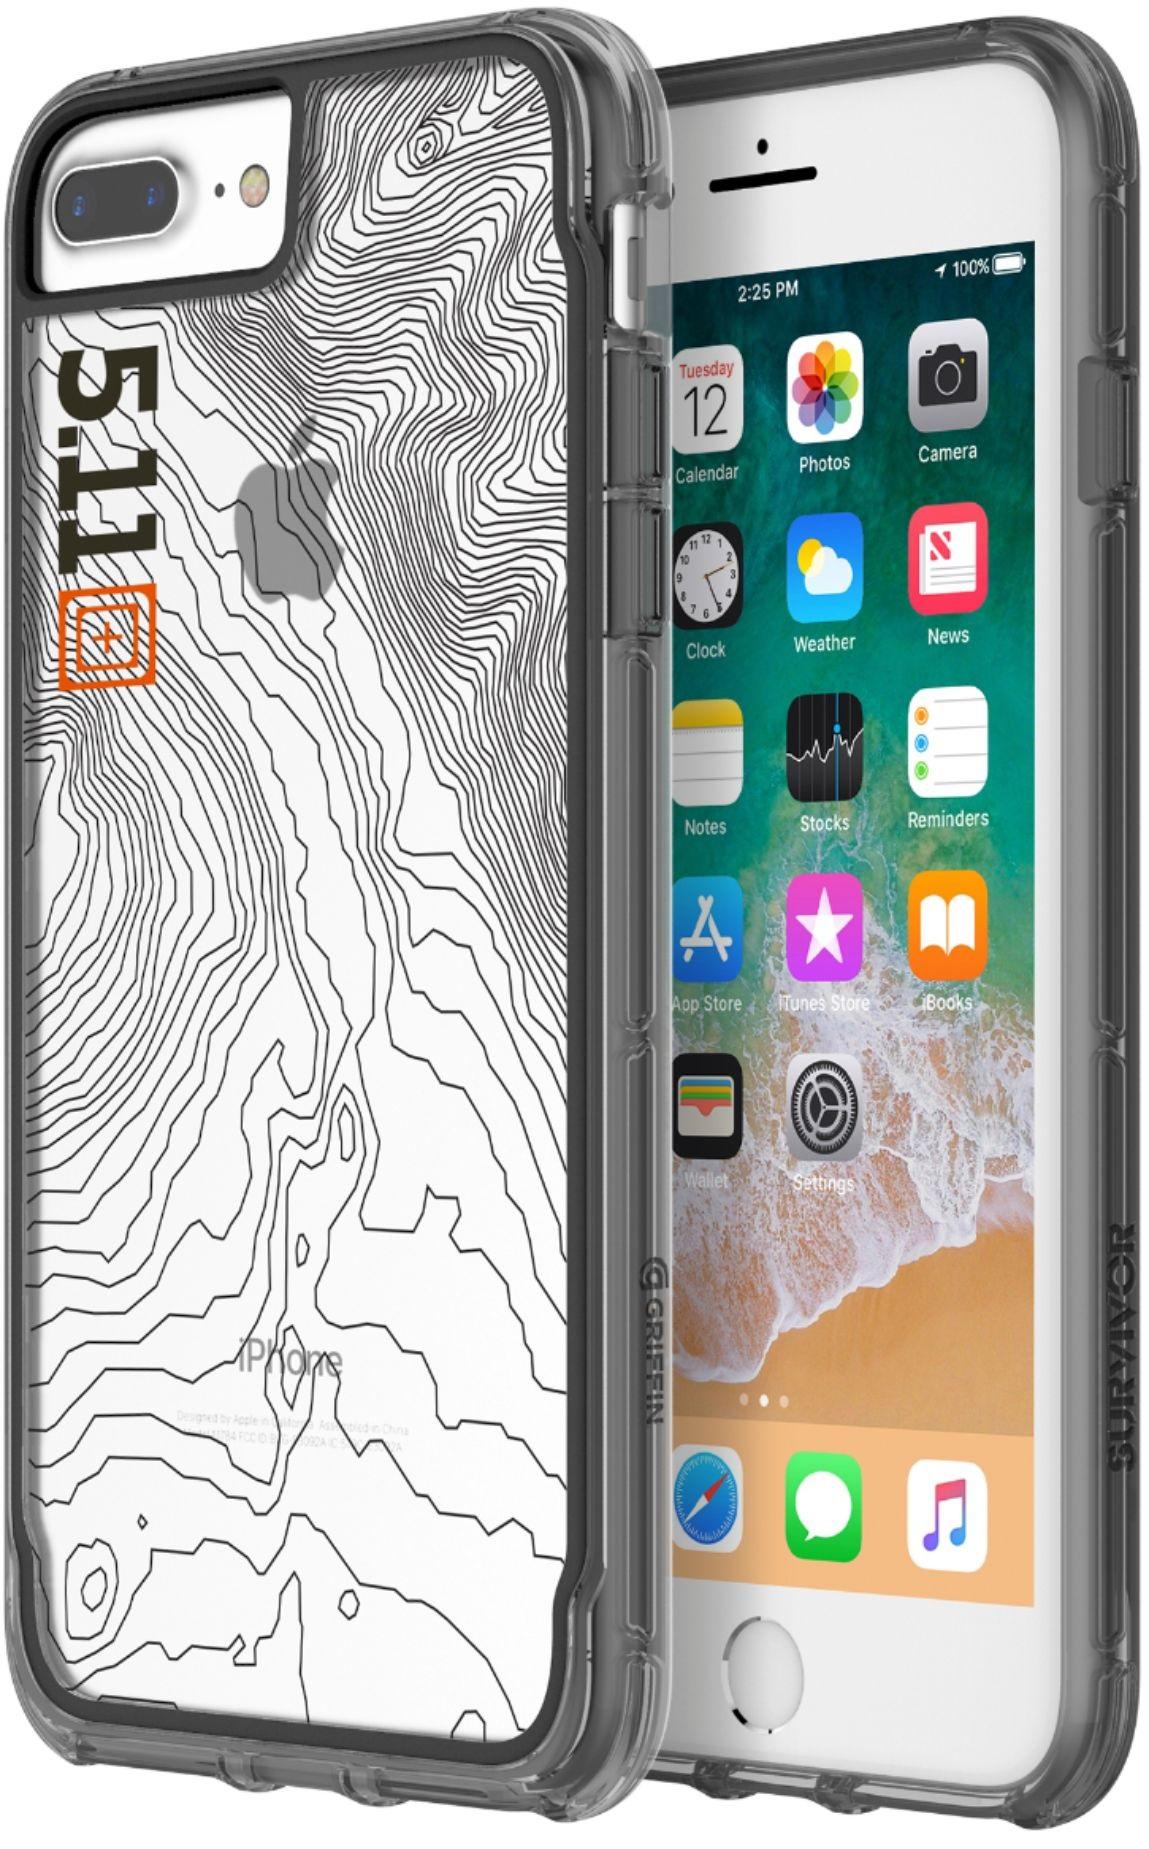 buy popular b8c26 ca0fc Details about Griffin Survivor 5.11 Protective Case for iPhone 8Plus/7Plus  - Clear/Black/Gray